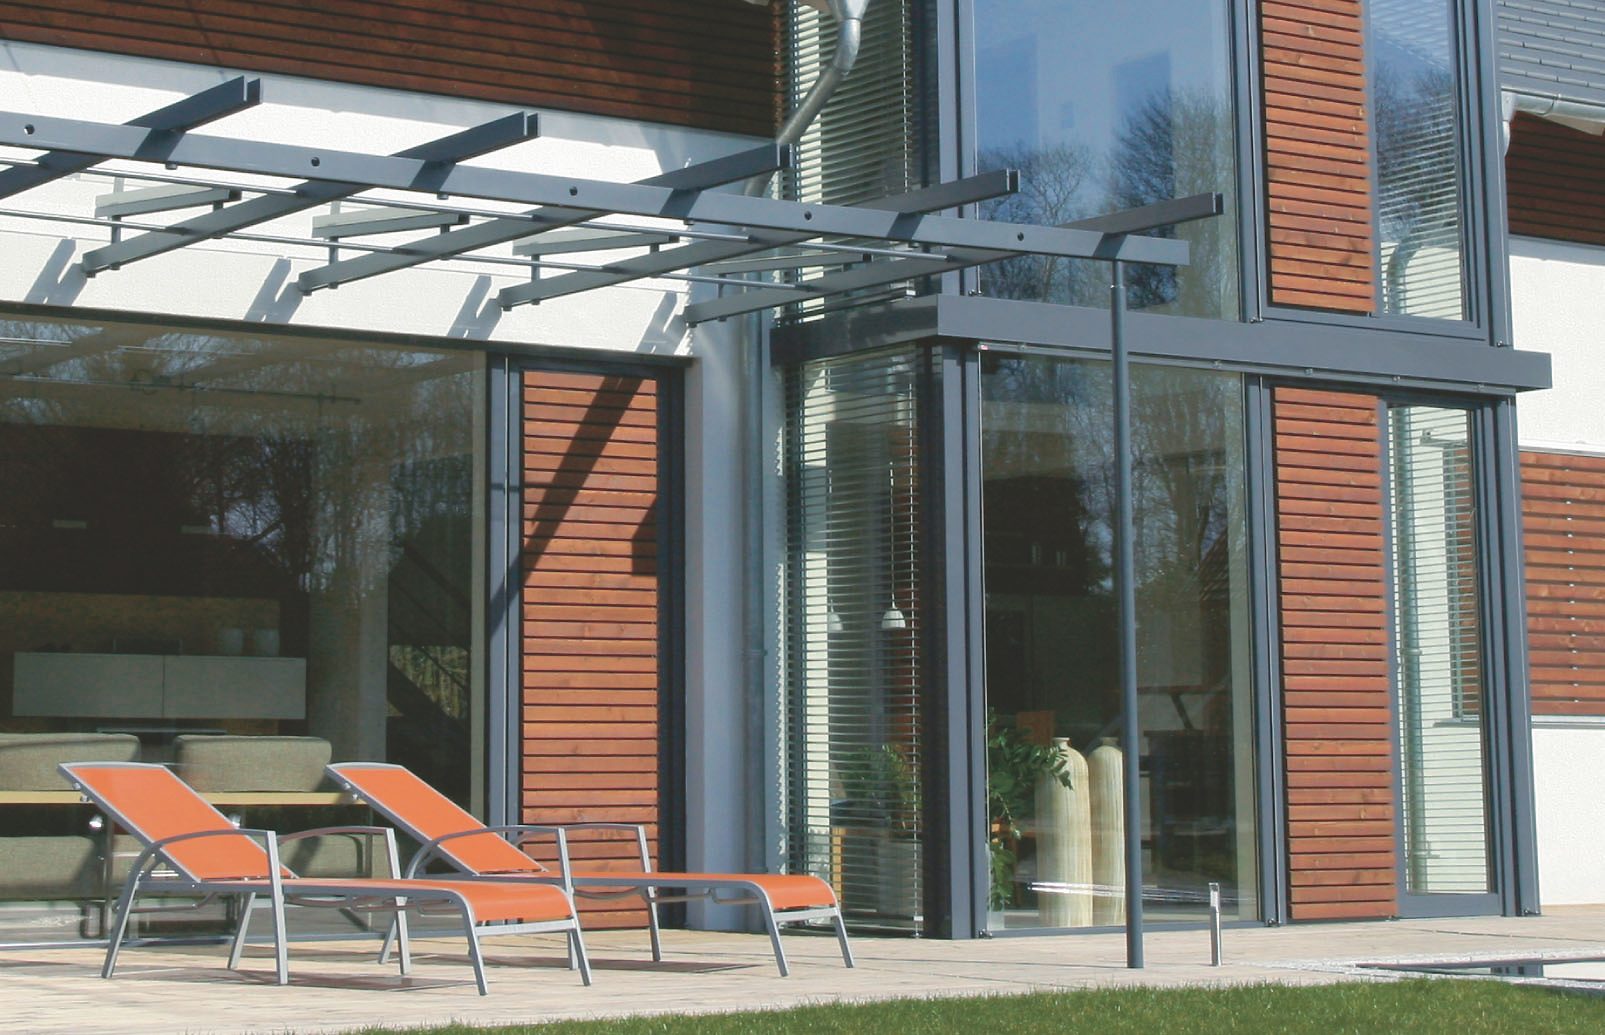 lasur wetterfest witterungsbest ndig alpina premium lasur nussbaum alpina farben. Black Bedroom Furniture Sets. Home Design Ideas